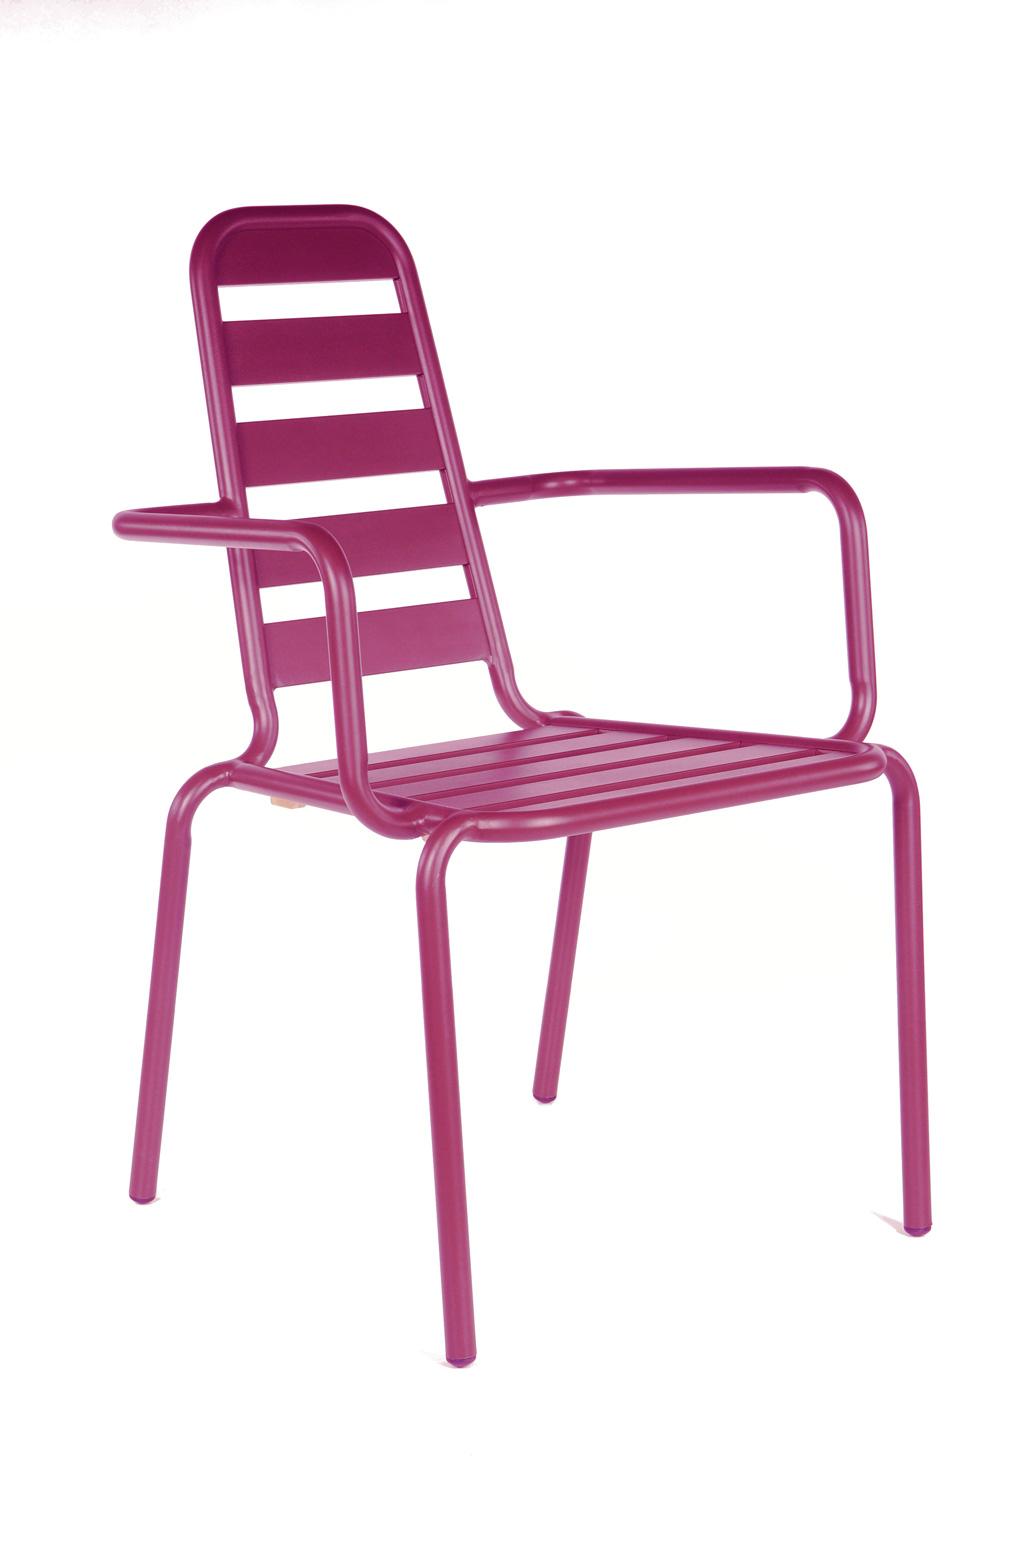 fauteuil menu fushia oceo sun mobilier. Black Bedroom Furniture Sets. Home Design Ideas